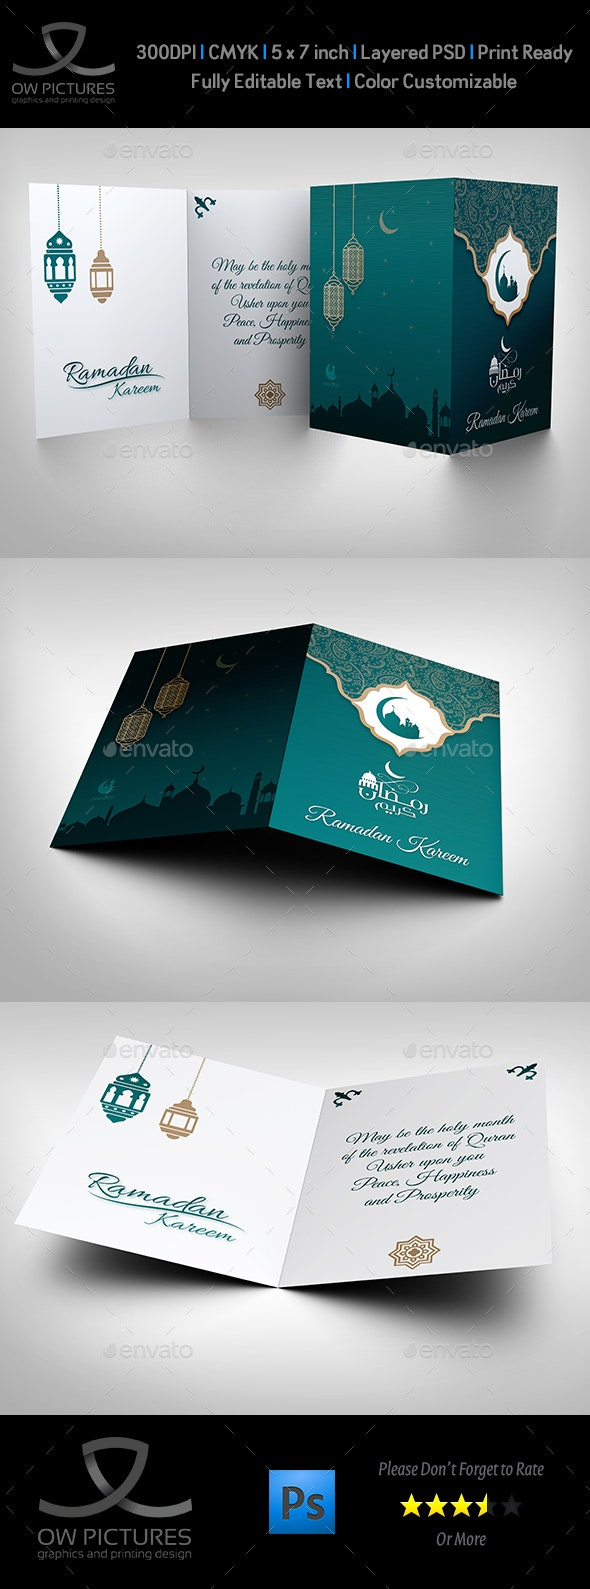 Ramadan Kareem Greeting Card - Cards & Invites Print Templates